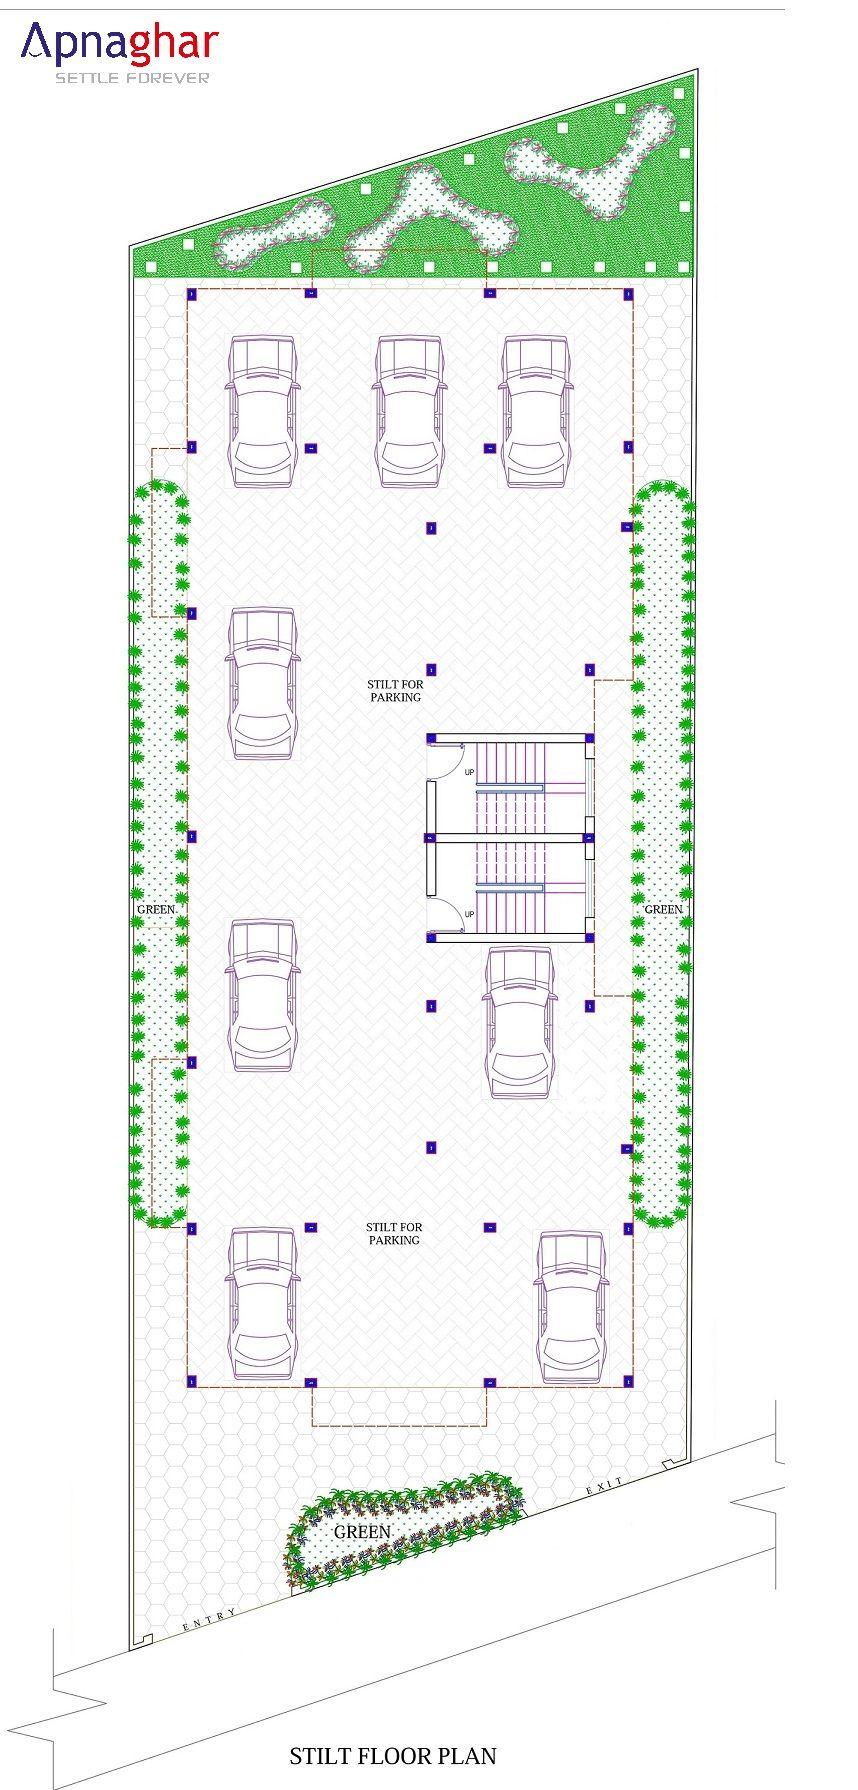 Stilt Floor Plan Designed By Apnaghar Team For More Details Visit Www Apnaghar Co In Floor Plan Design Plumbing Drawing Architectural Services